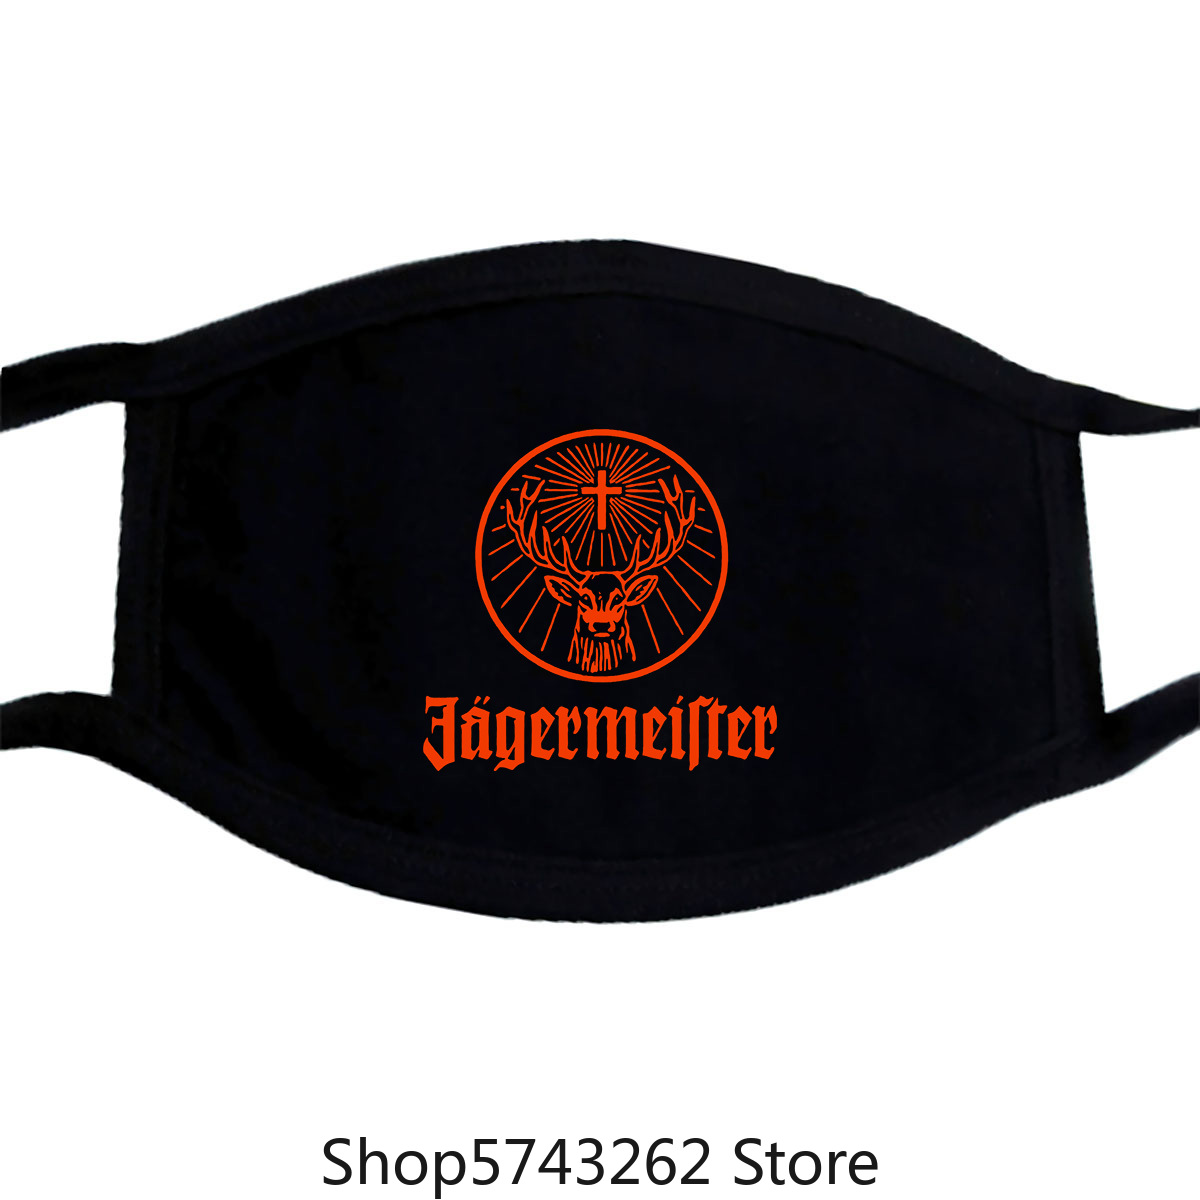 Jagermeister German Logo Men'S Mask S To 3Xl Washable Reusable Mask For Unisex Black